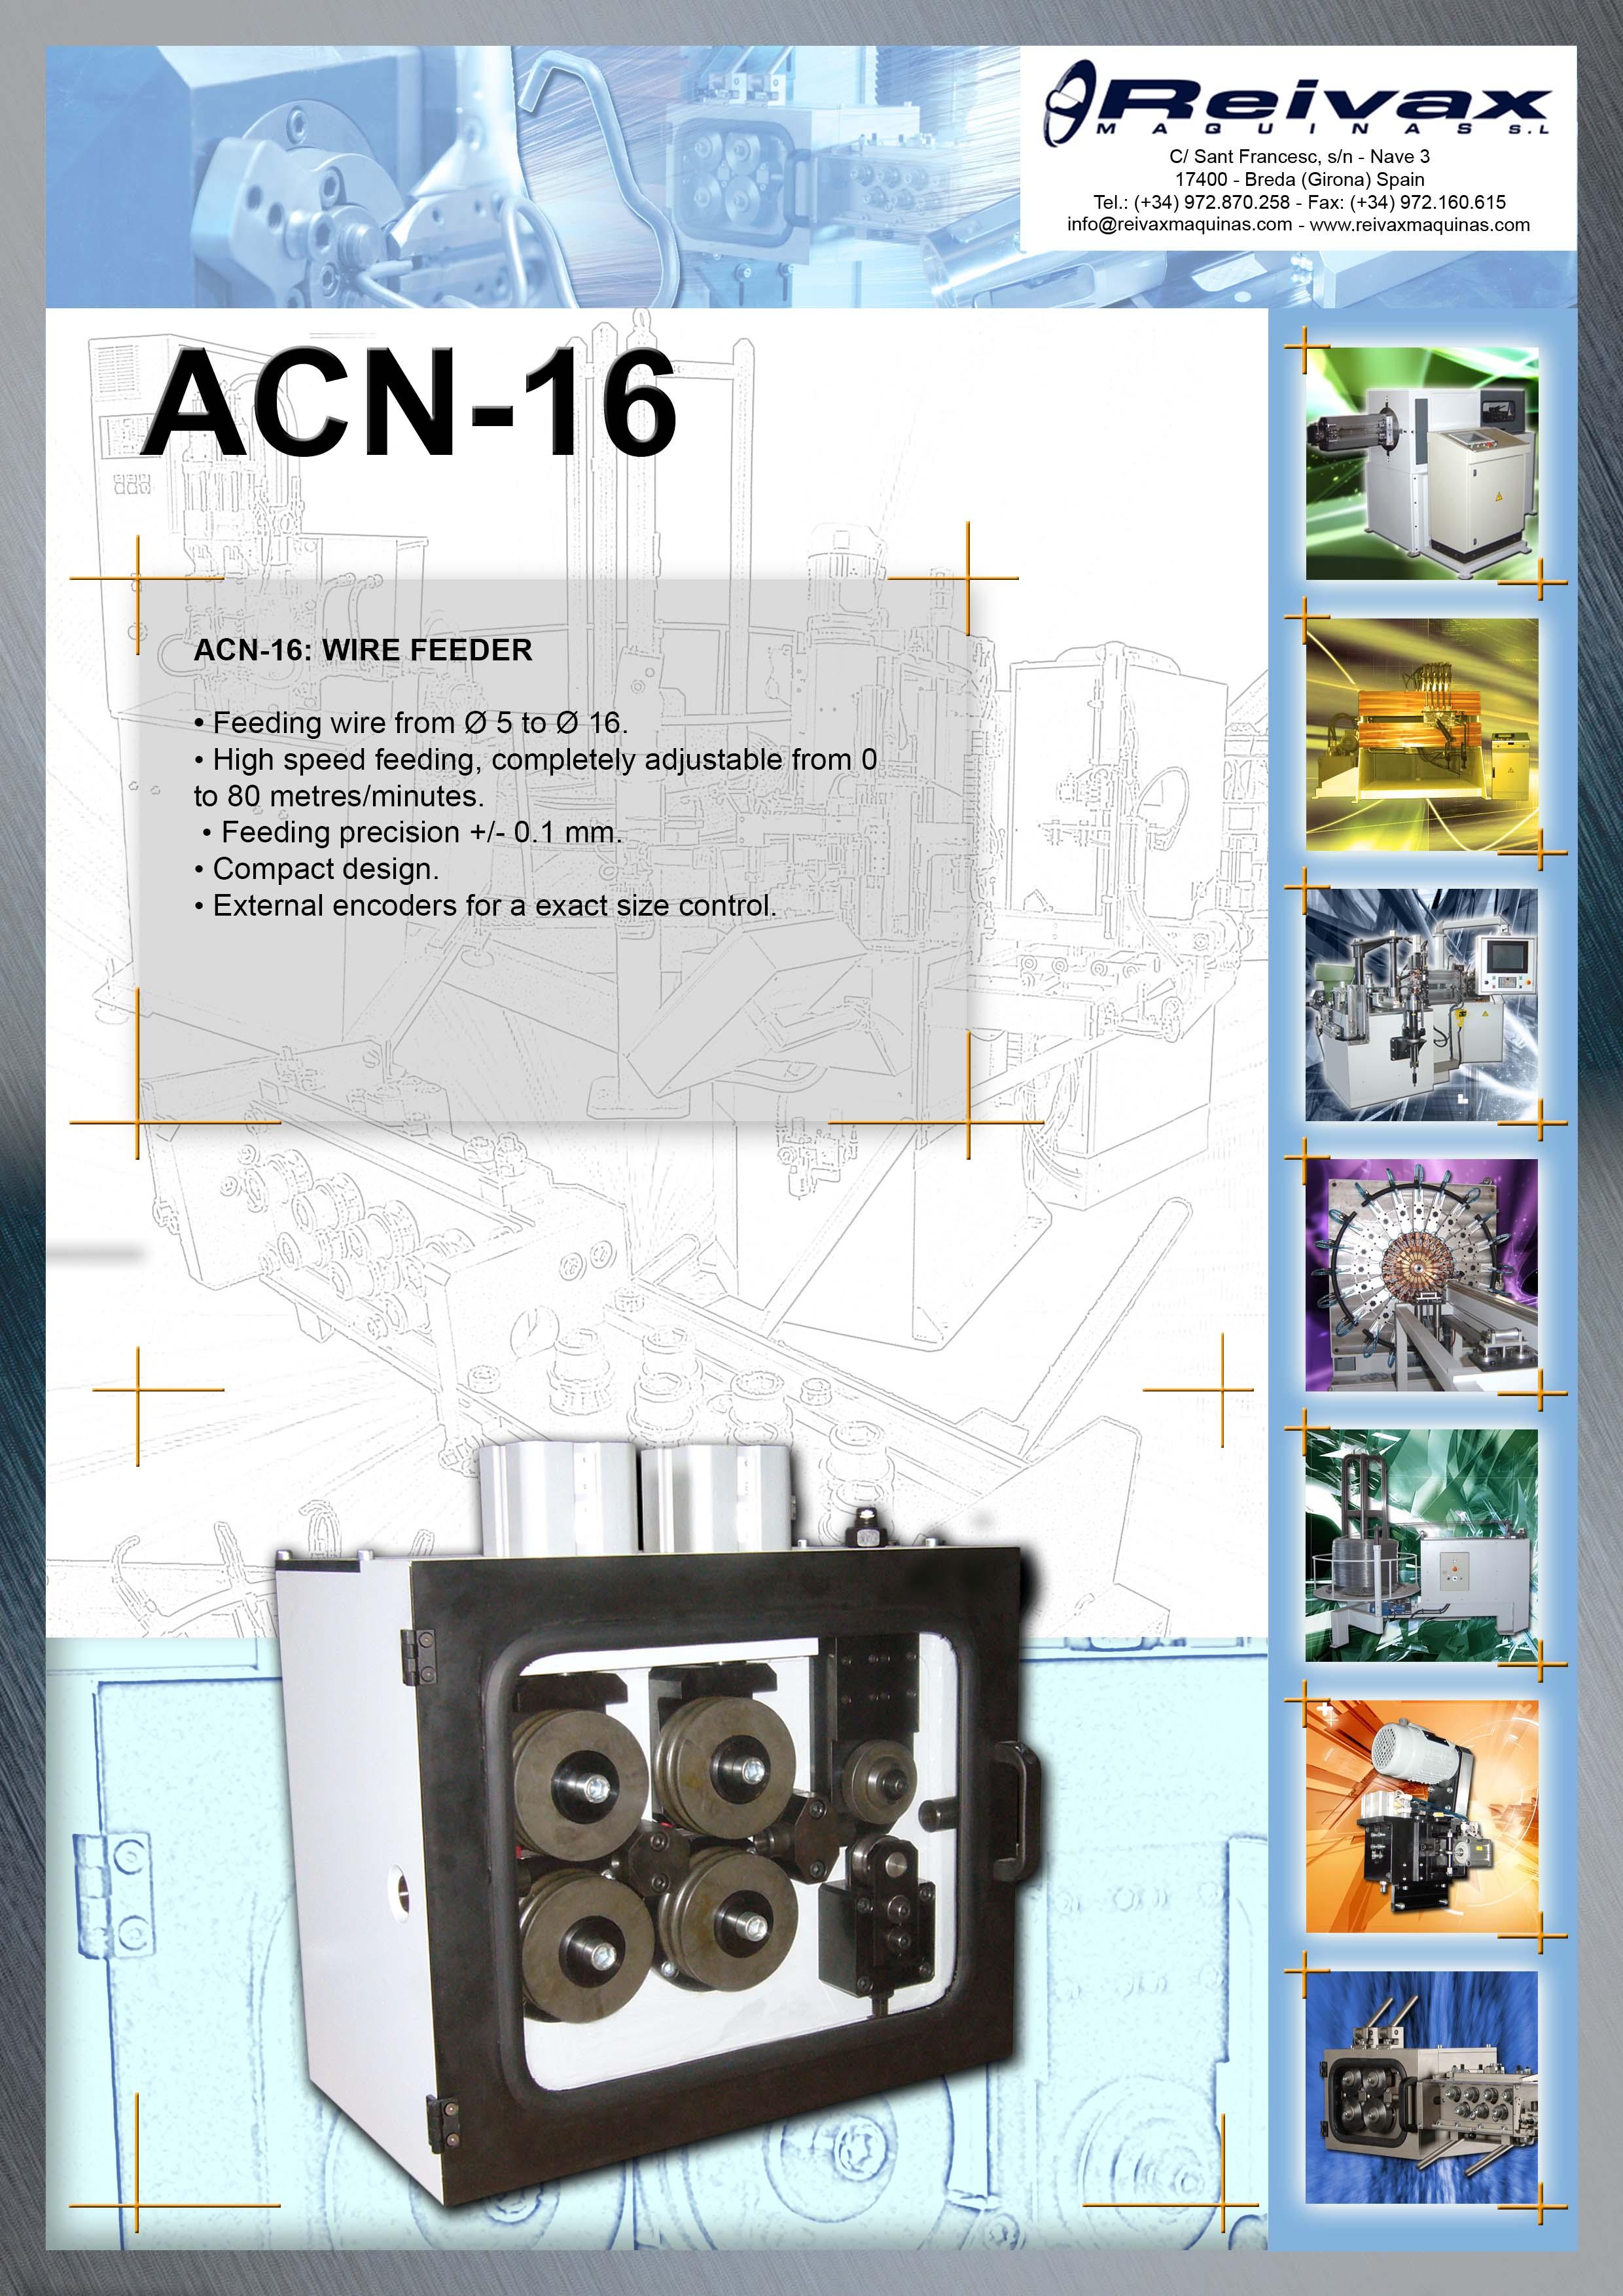 ReivaxMaquinas: Technical Details ACN-16